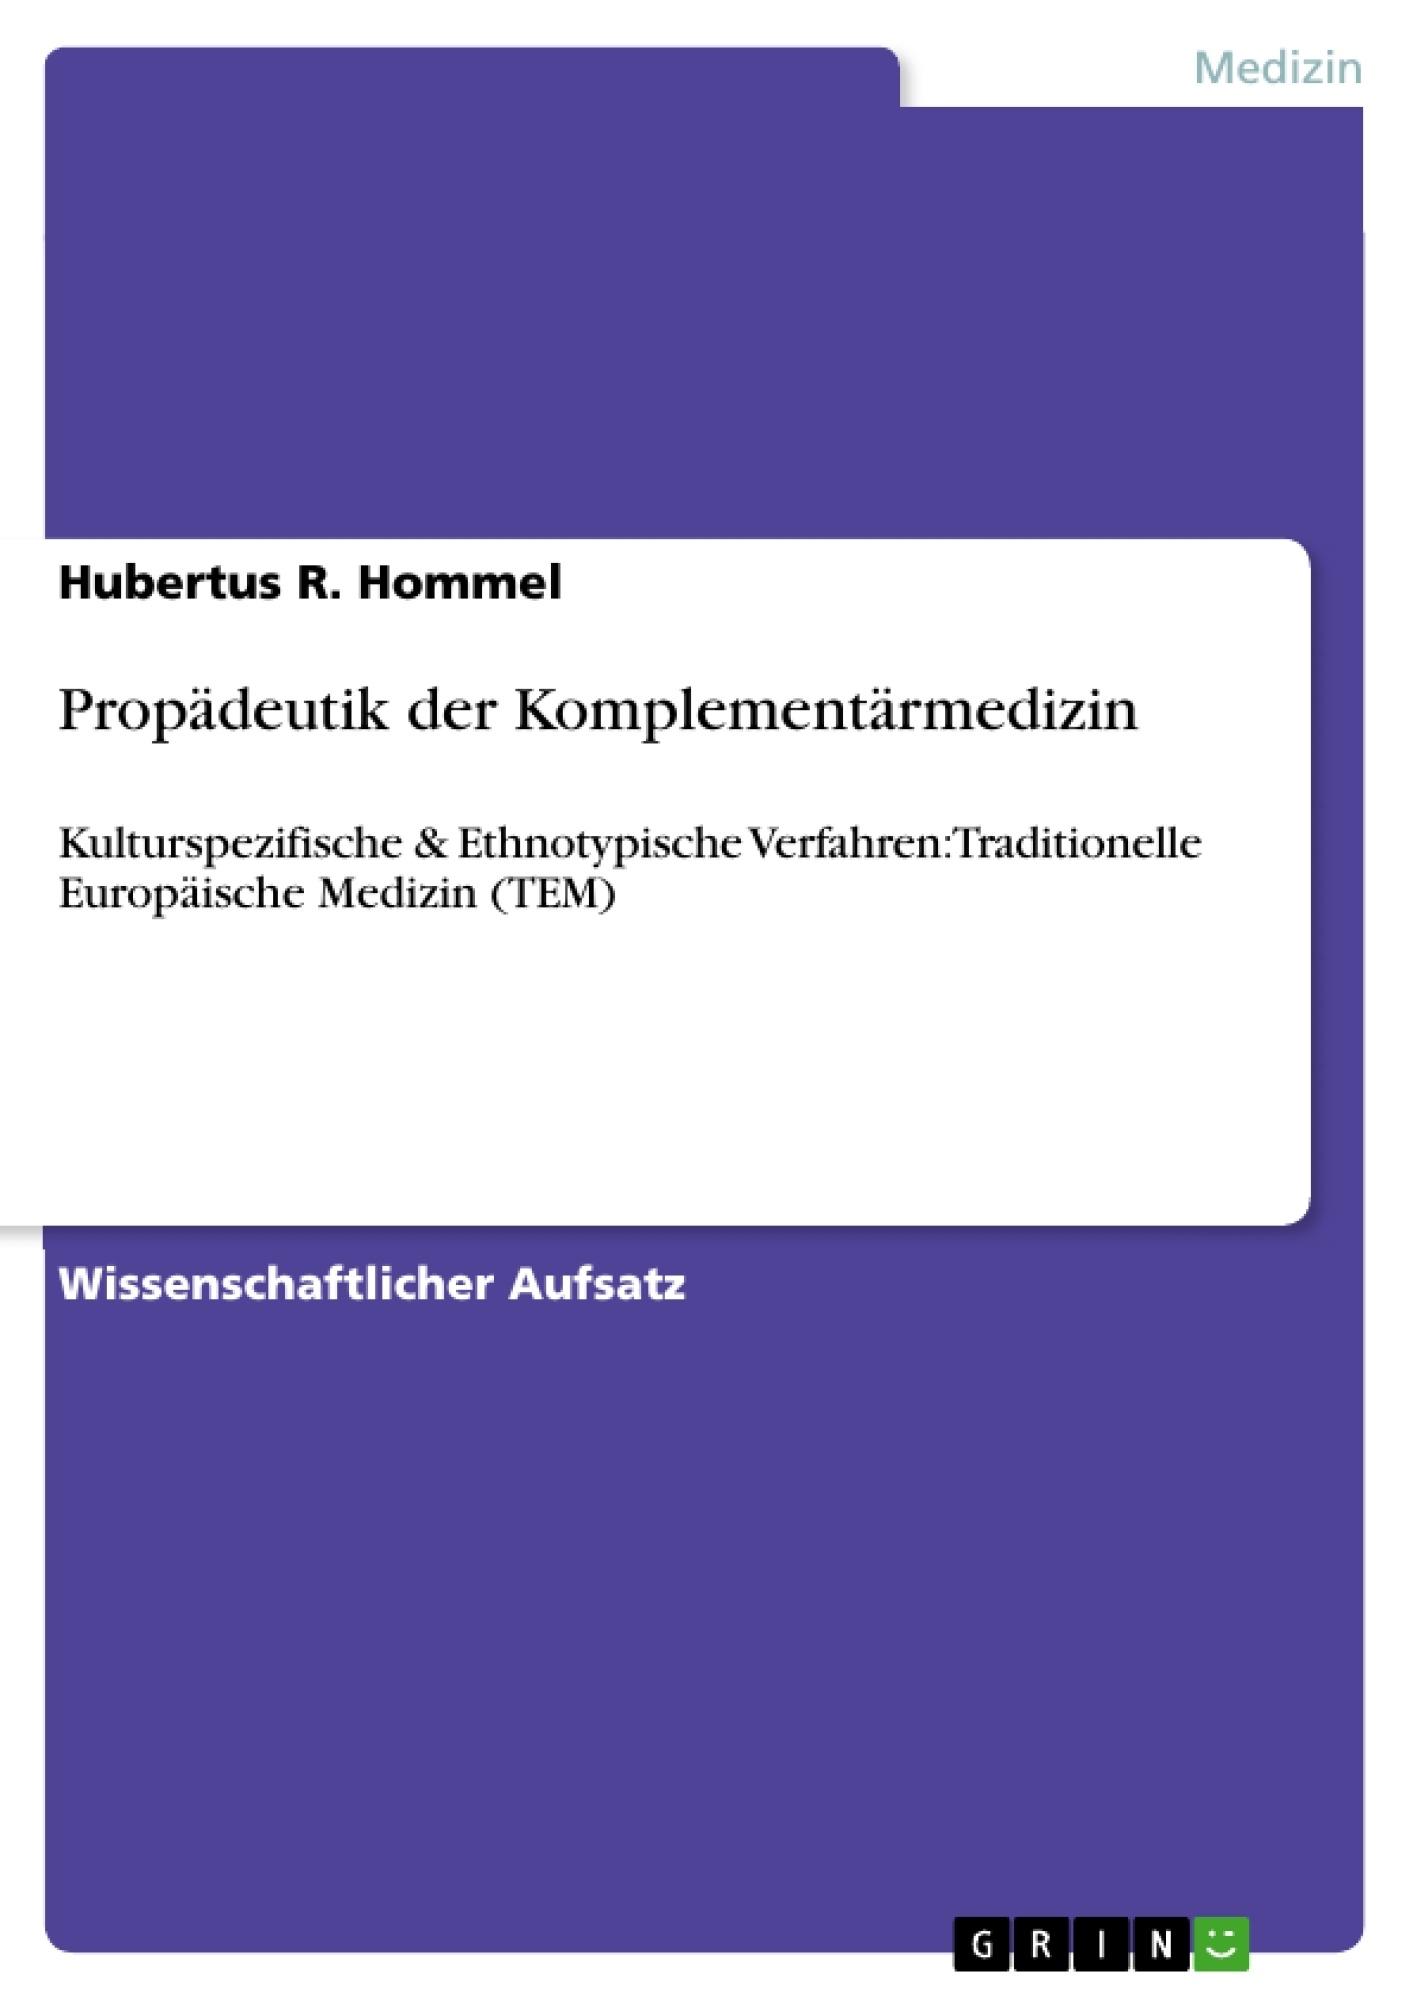 Titel: Propädeutik der Komplementärmedizin